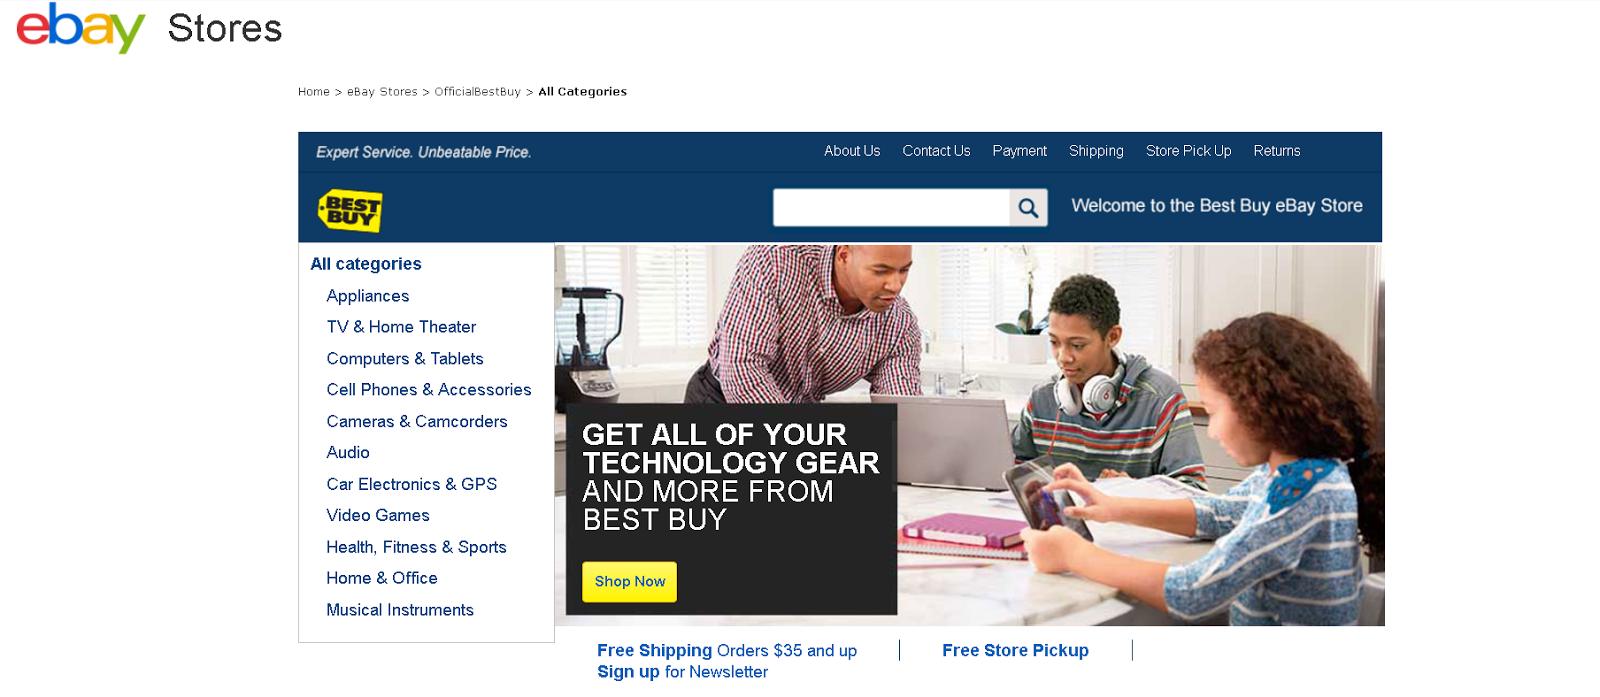 Best Buy eBay Store